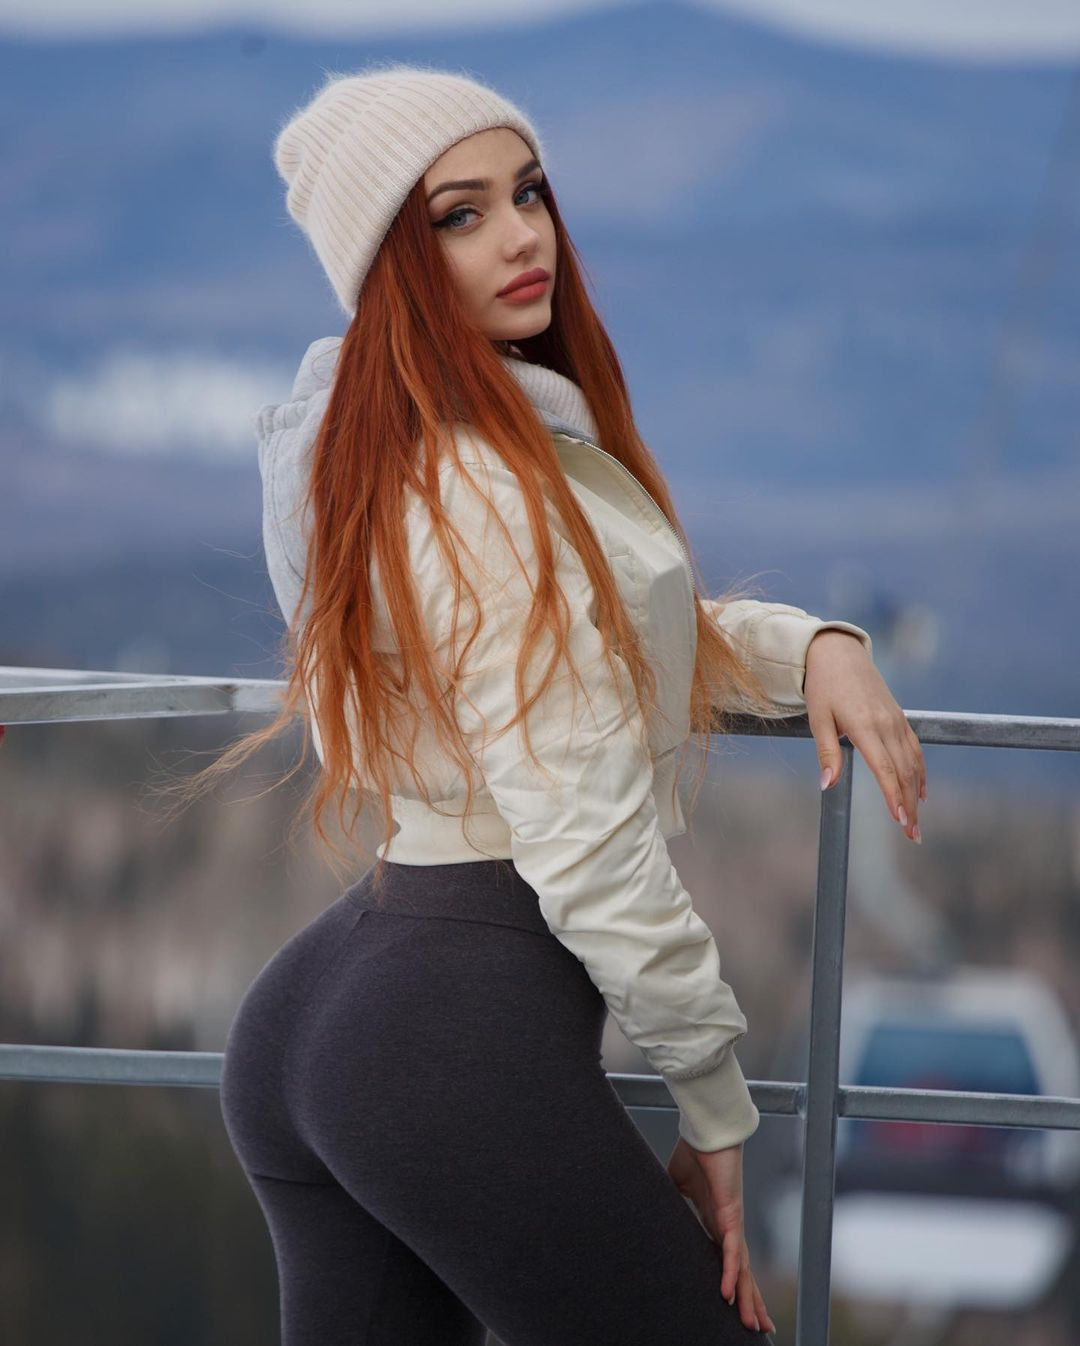 Russian Stylish Model DP